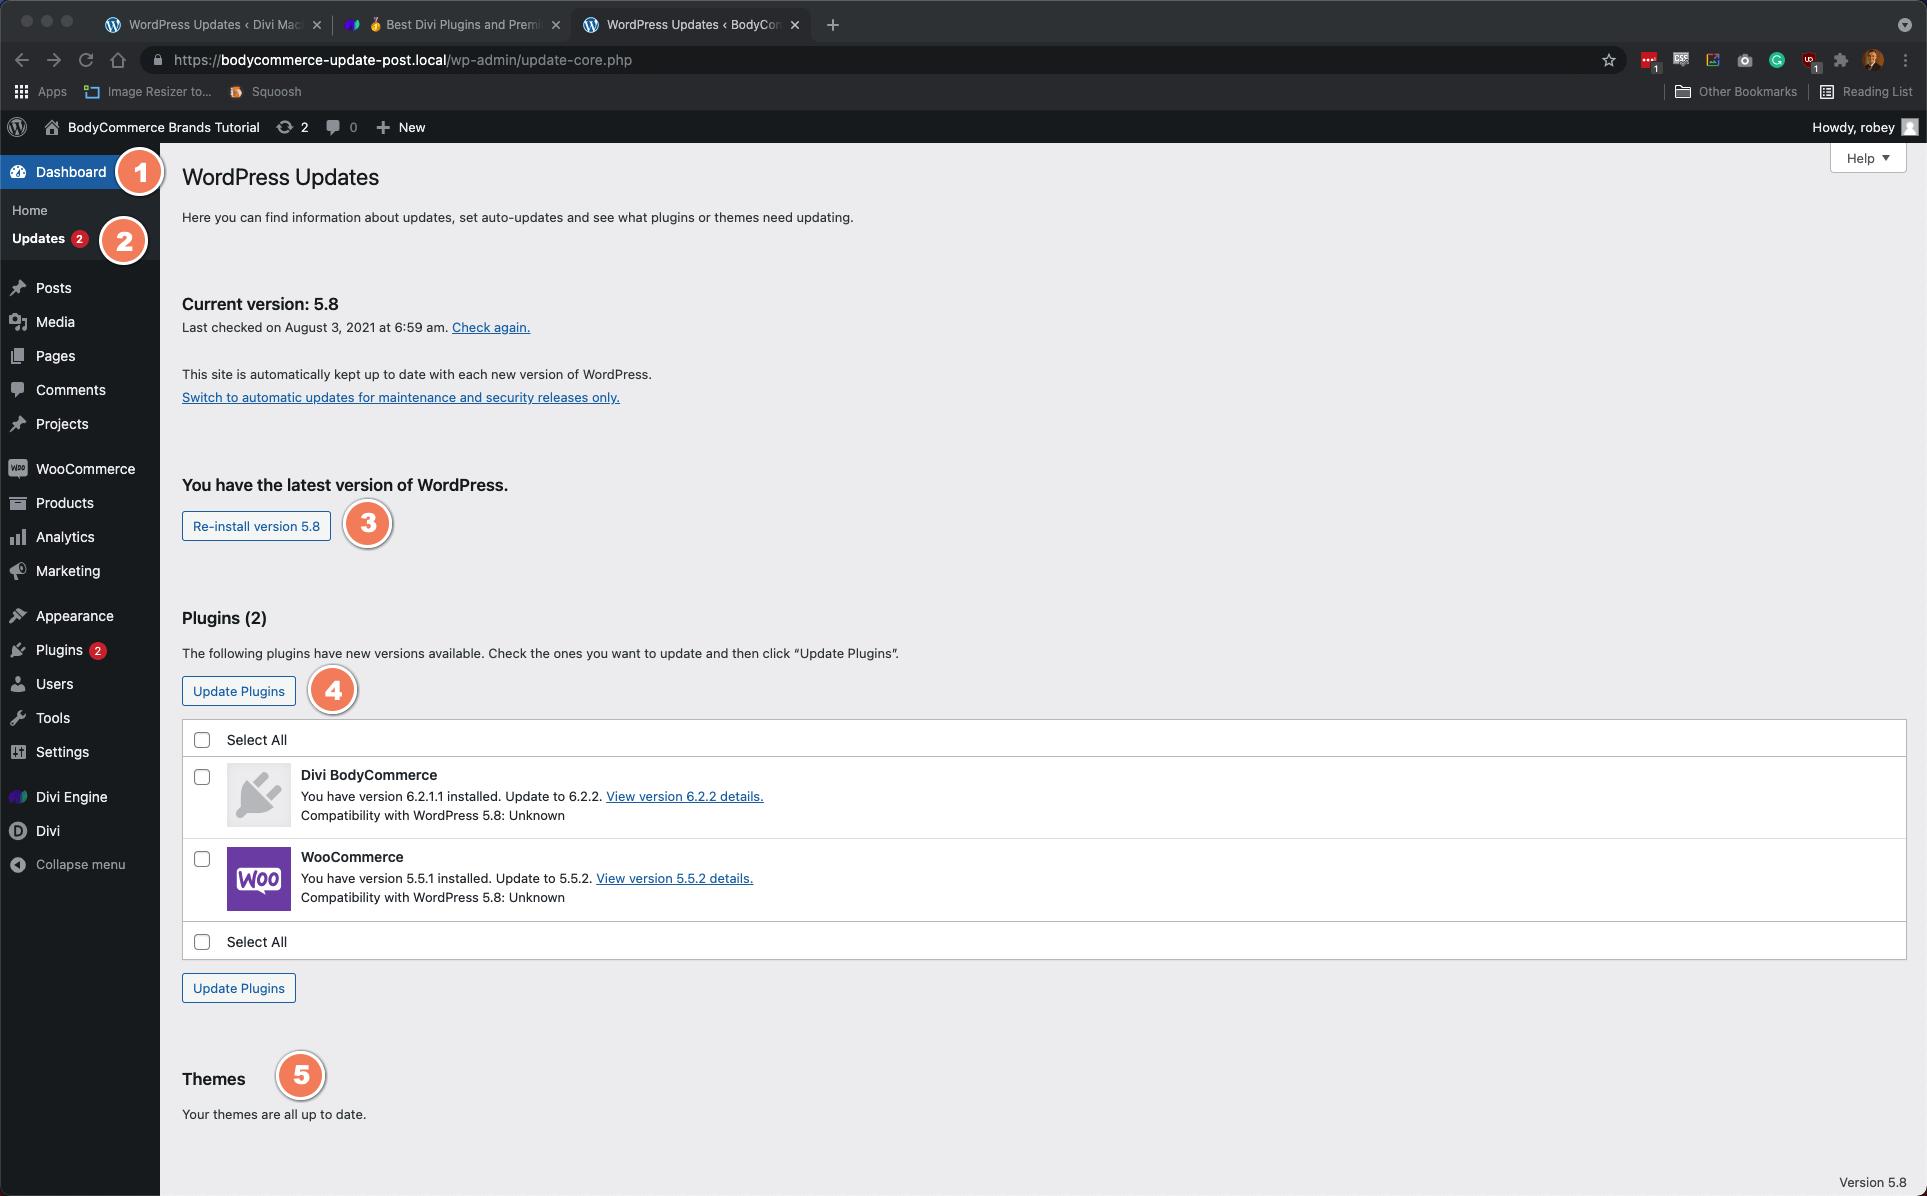 Update WordPress, Divi, and Plugins